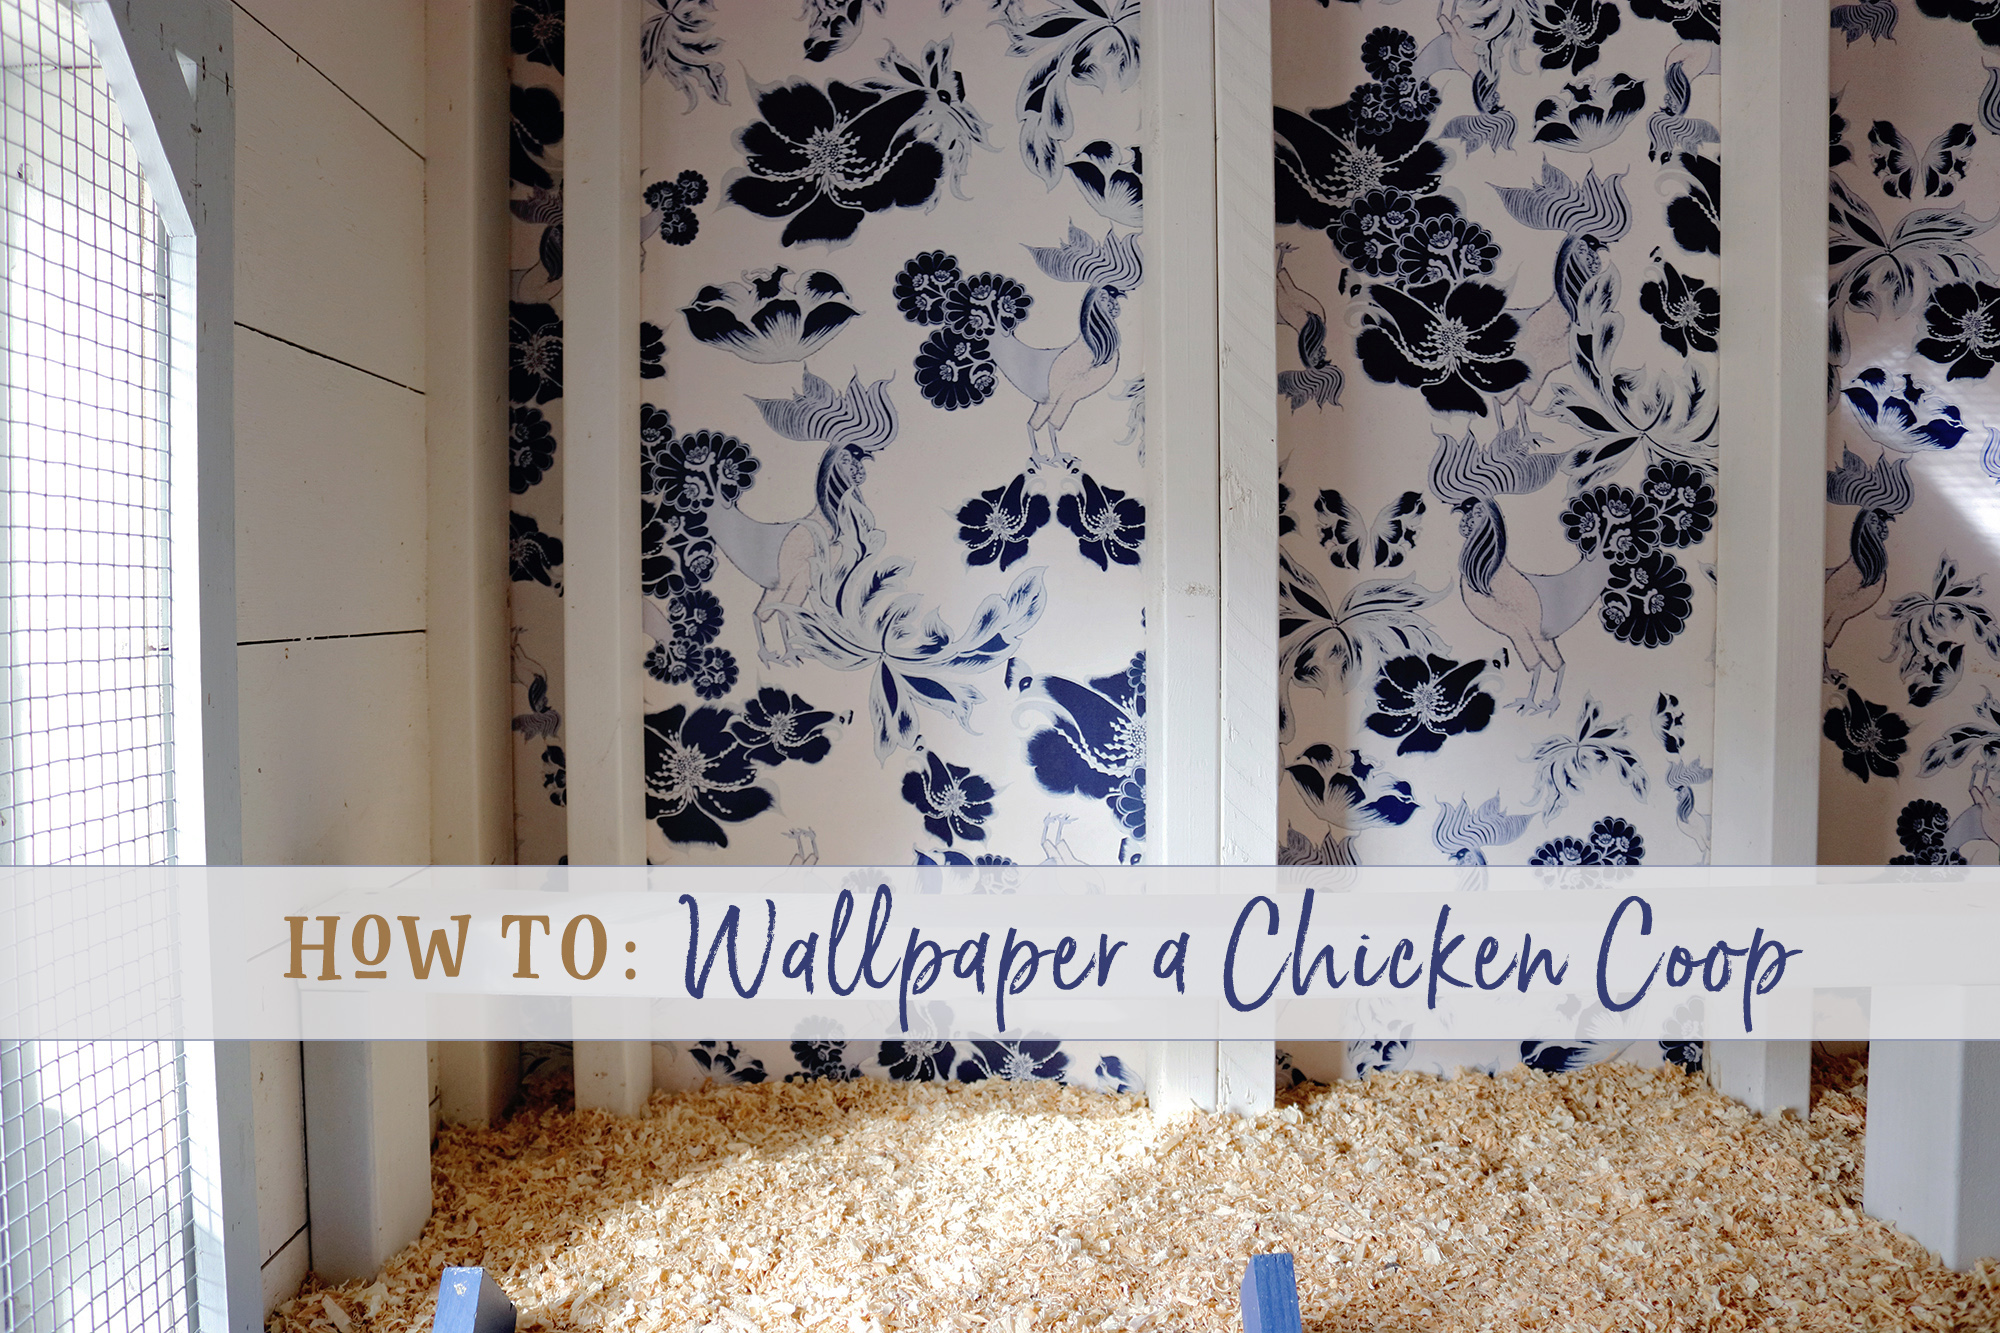 Three Little Blackbirds - How to Wallpaper a Chicken Coop